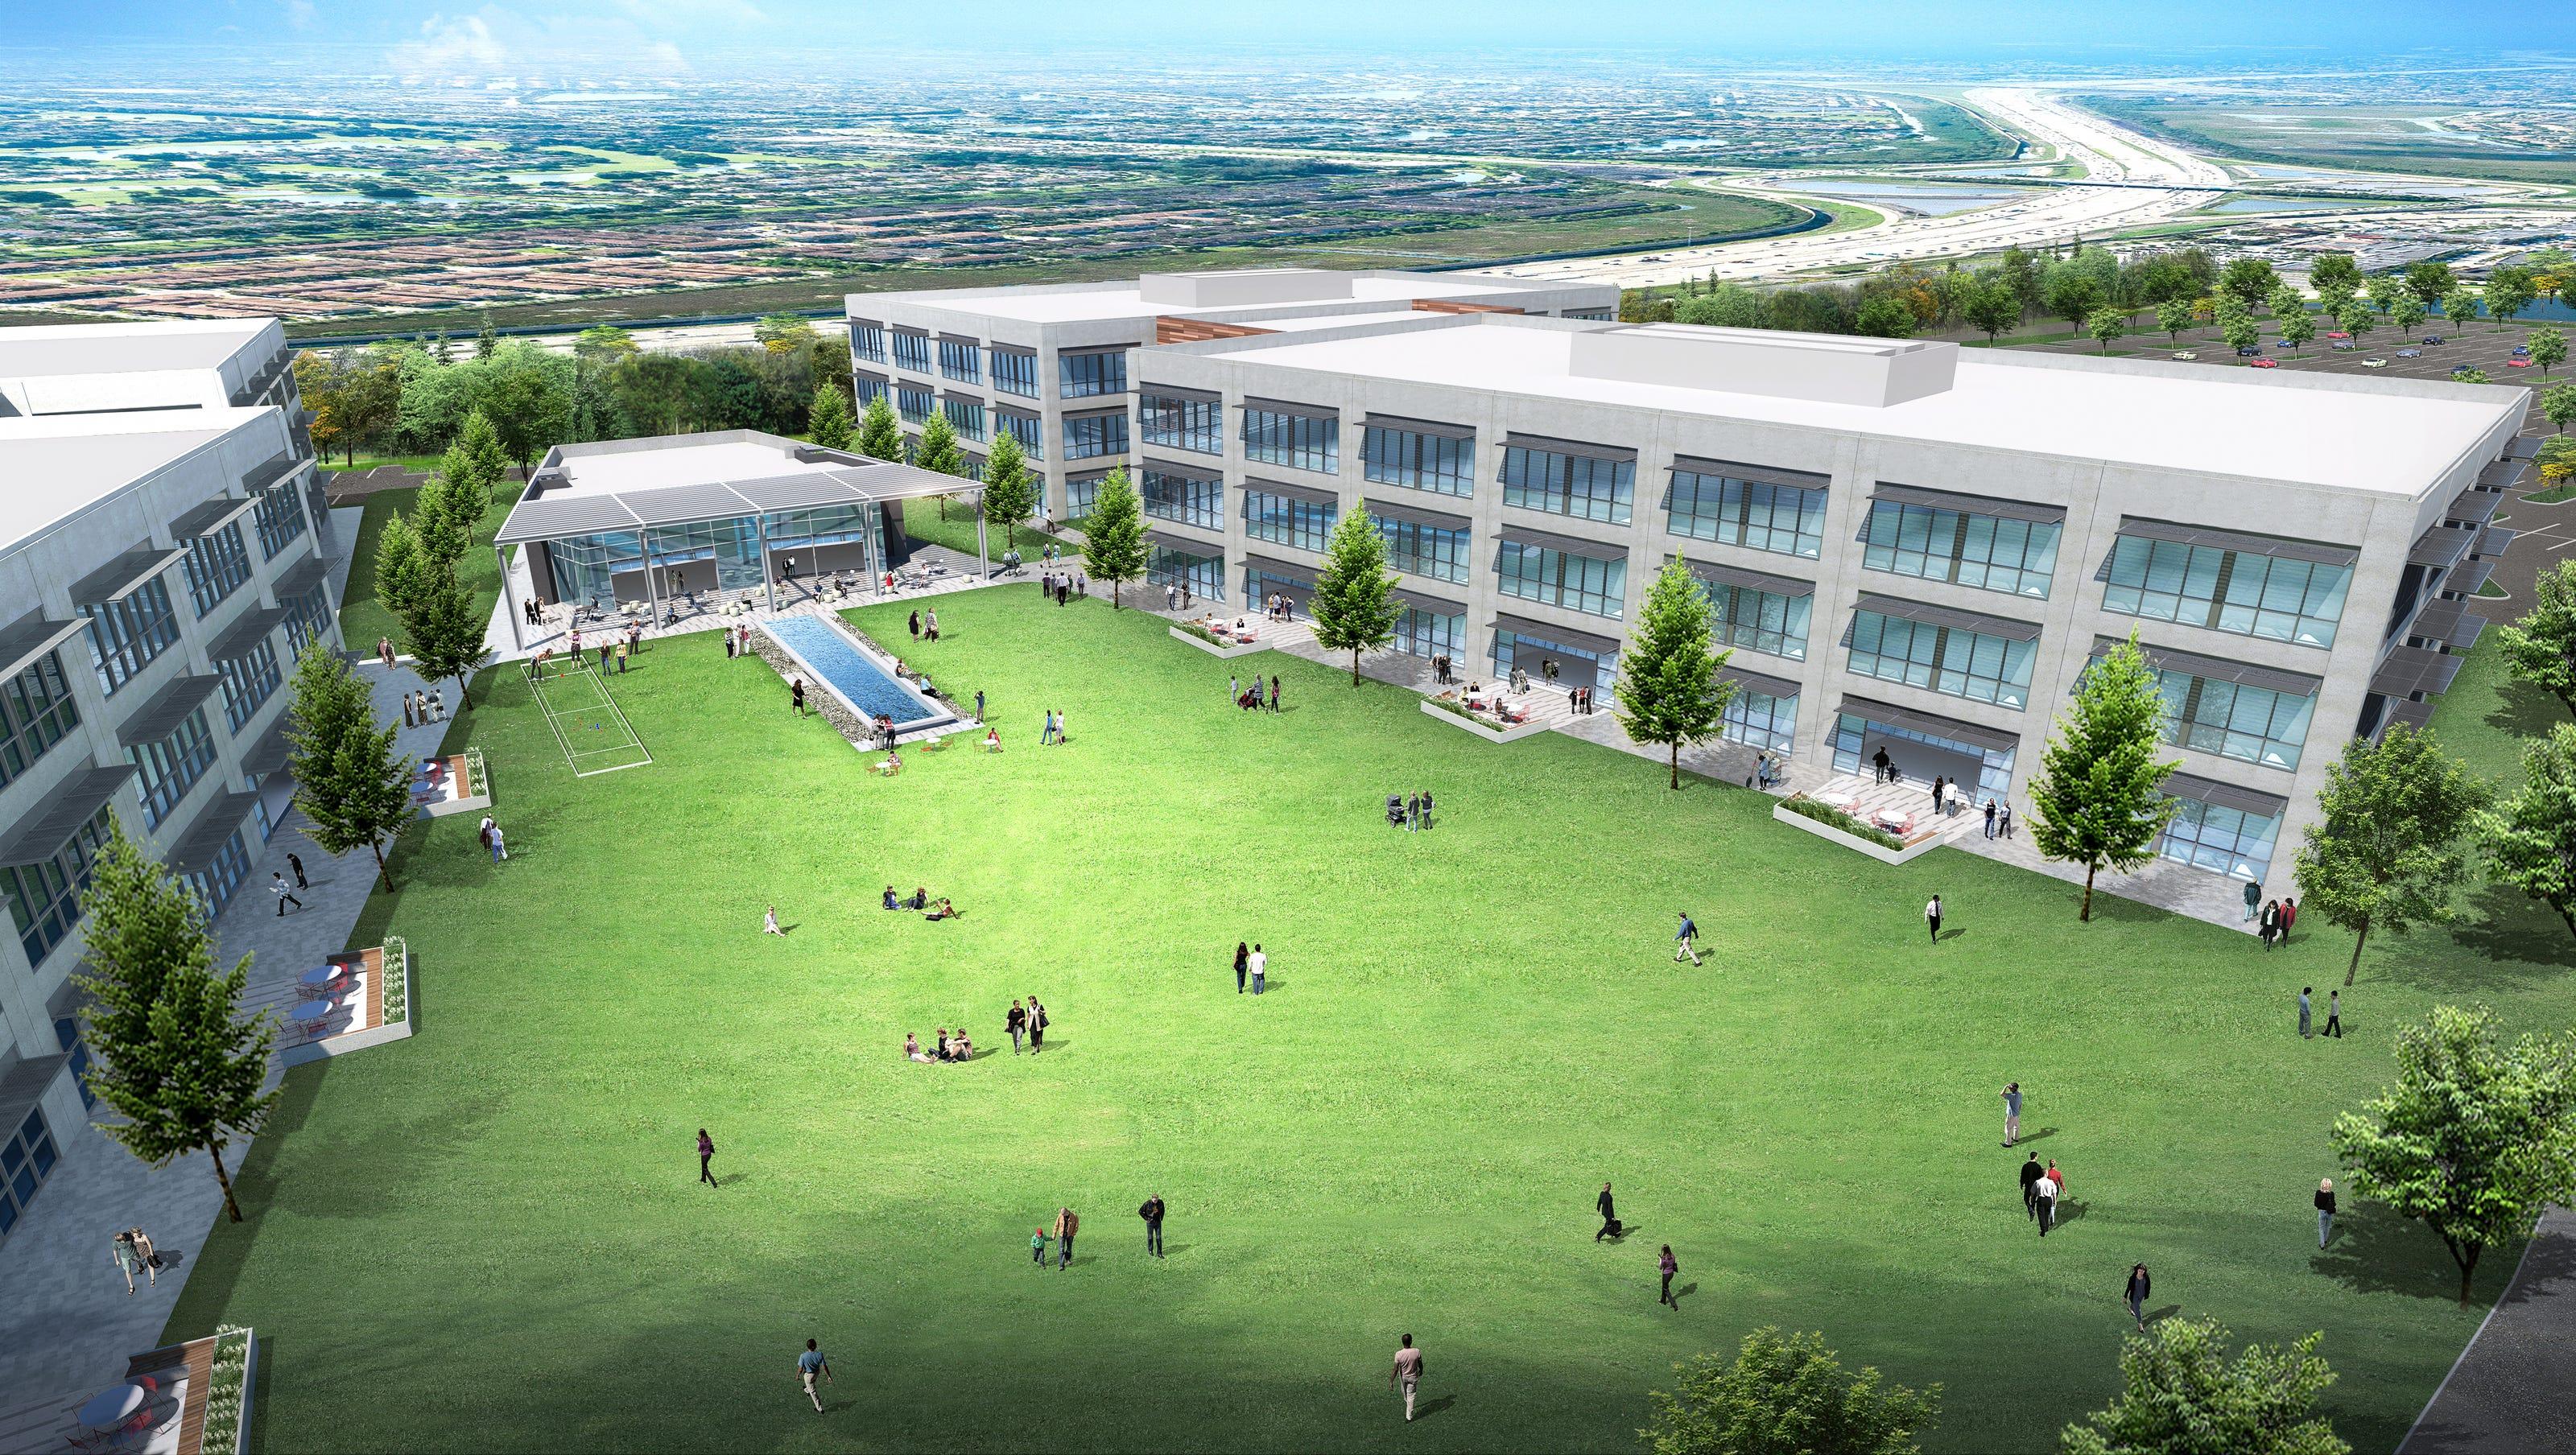 gartner to build new campus, double workforce